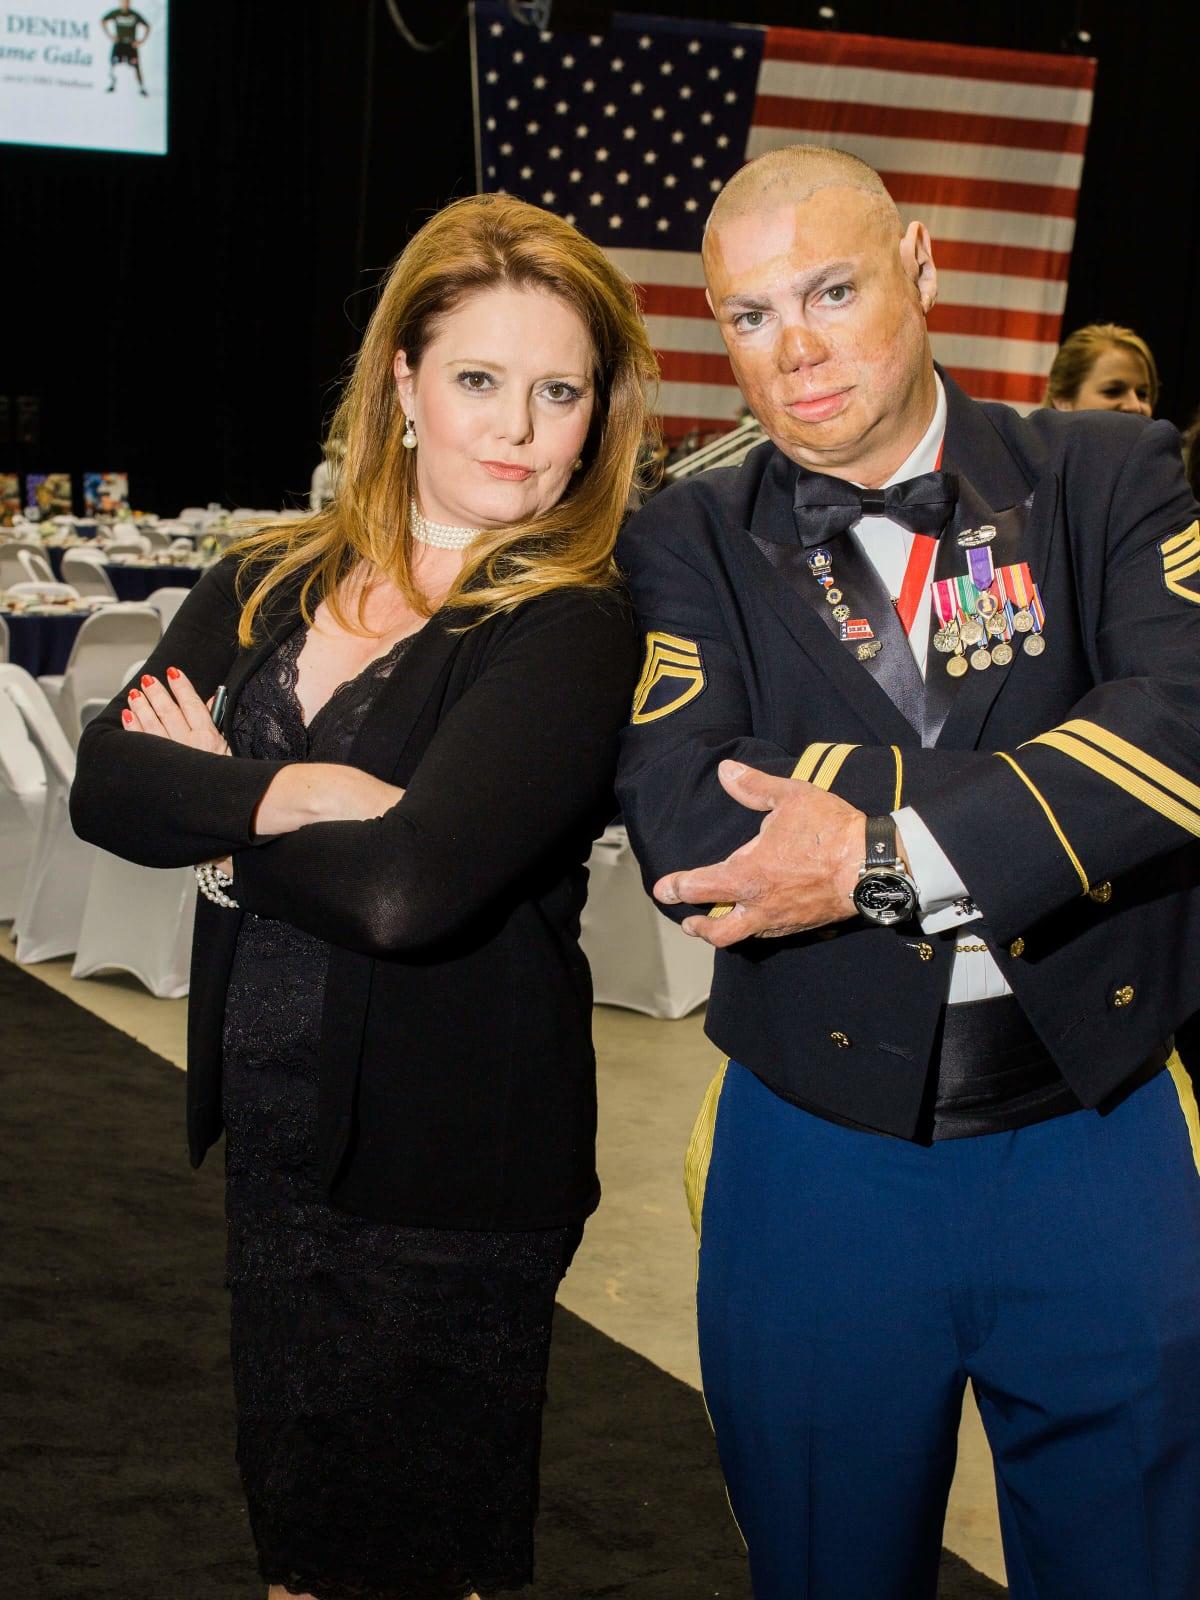 Houston, Impact A Hero Hall of Fame Gala, May 2016, Christine Dobbyn, Army Staff Sergeant, Shilo Harris